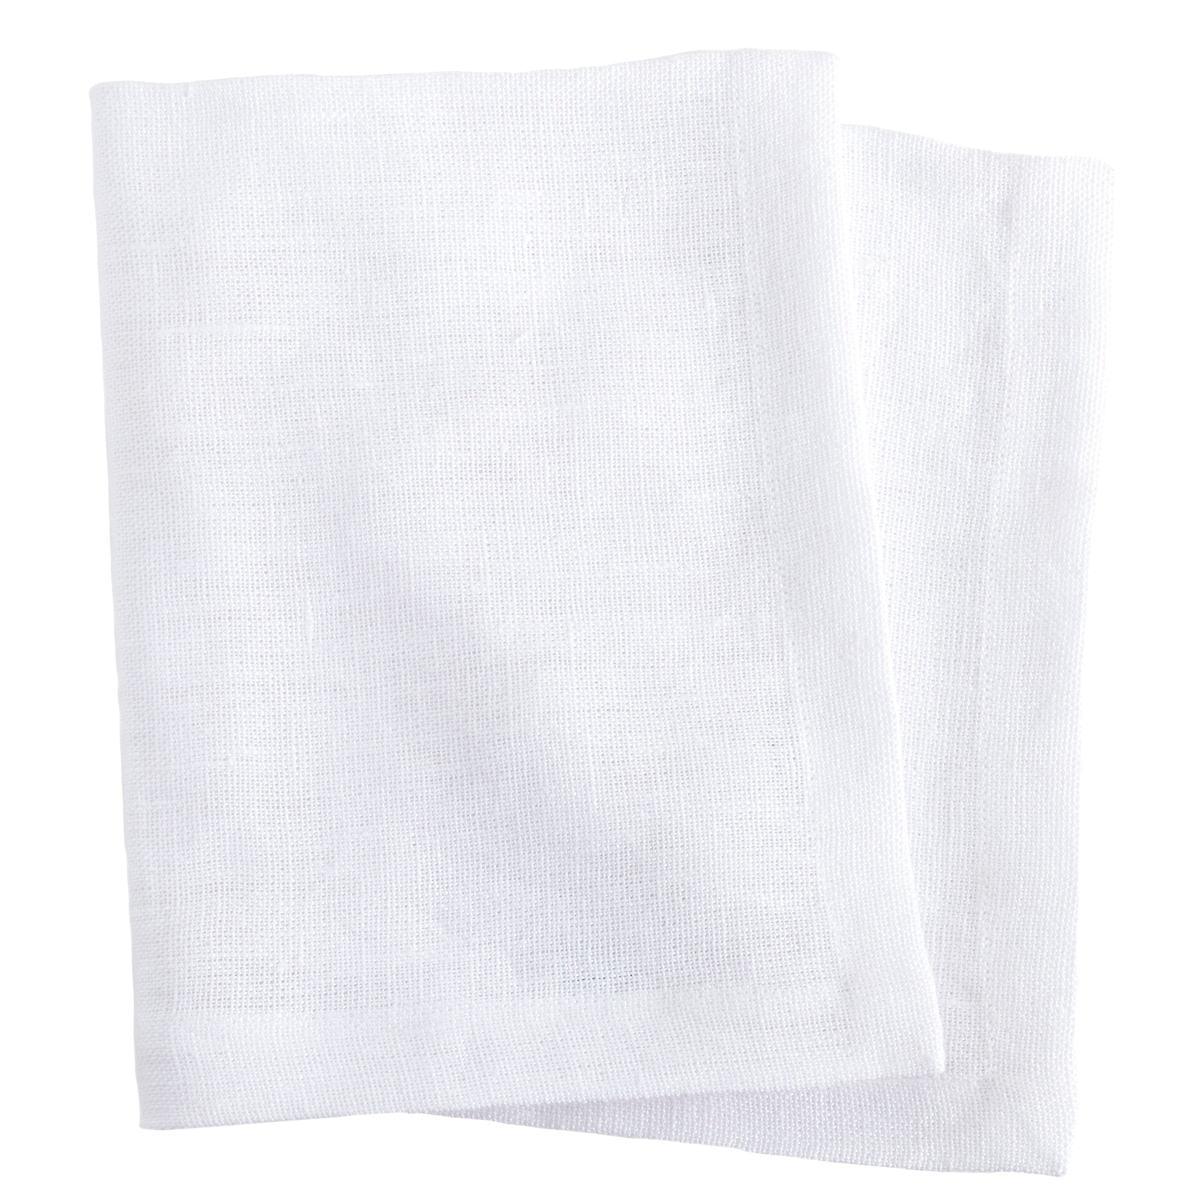 Stone Washed Linen White Napkin Set